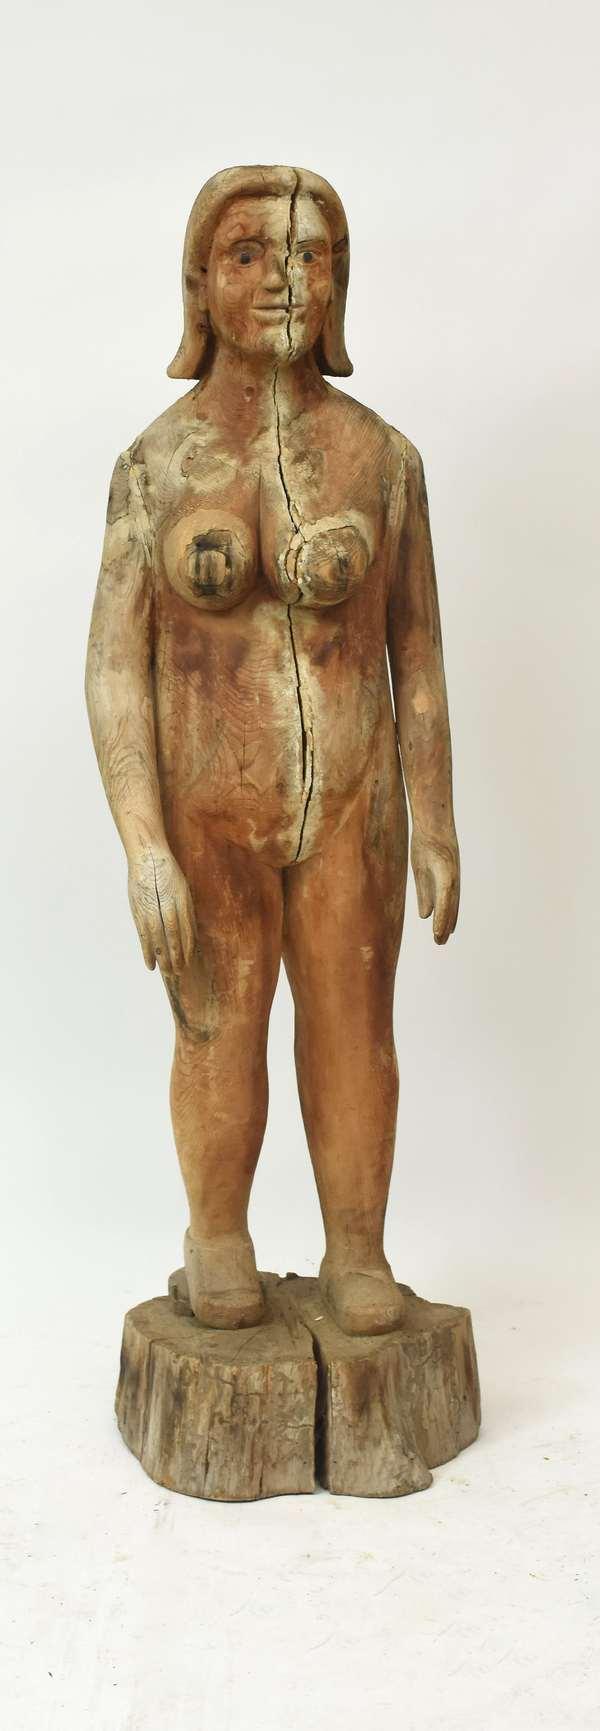 "Life-size carved wooden Outsider Folk Art female figurine, 67""H."